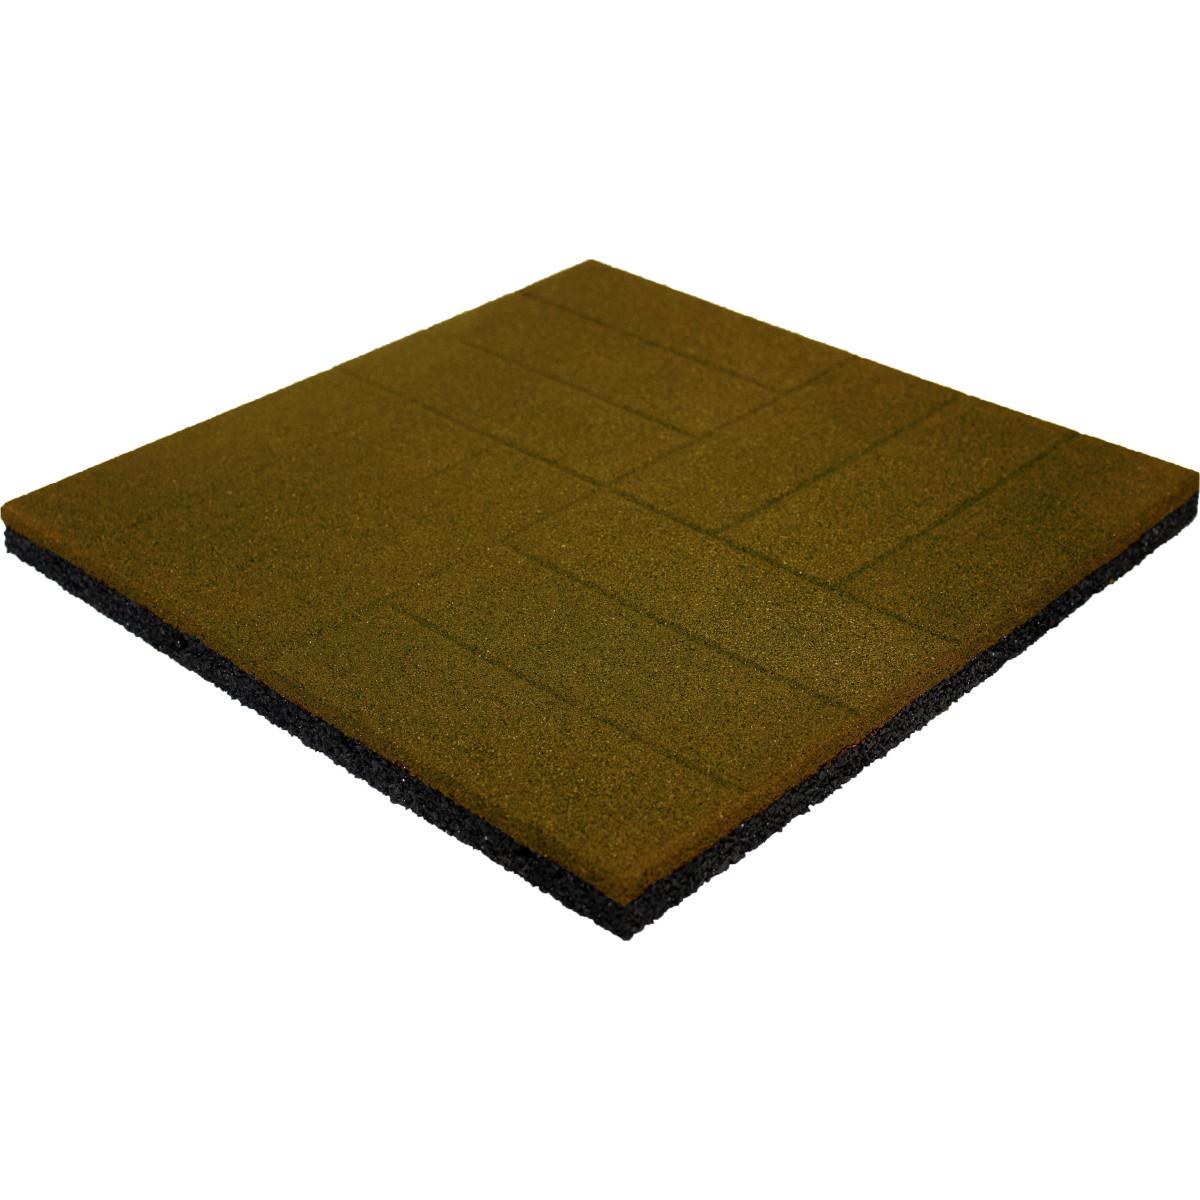 Плитка резиновая 500х500х30 паркет желтый